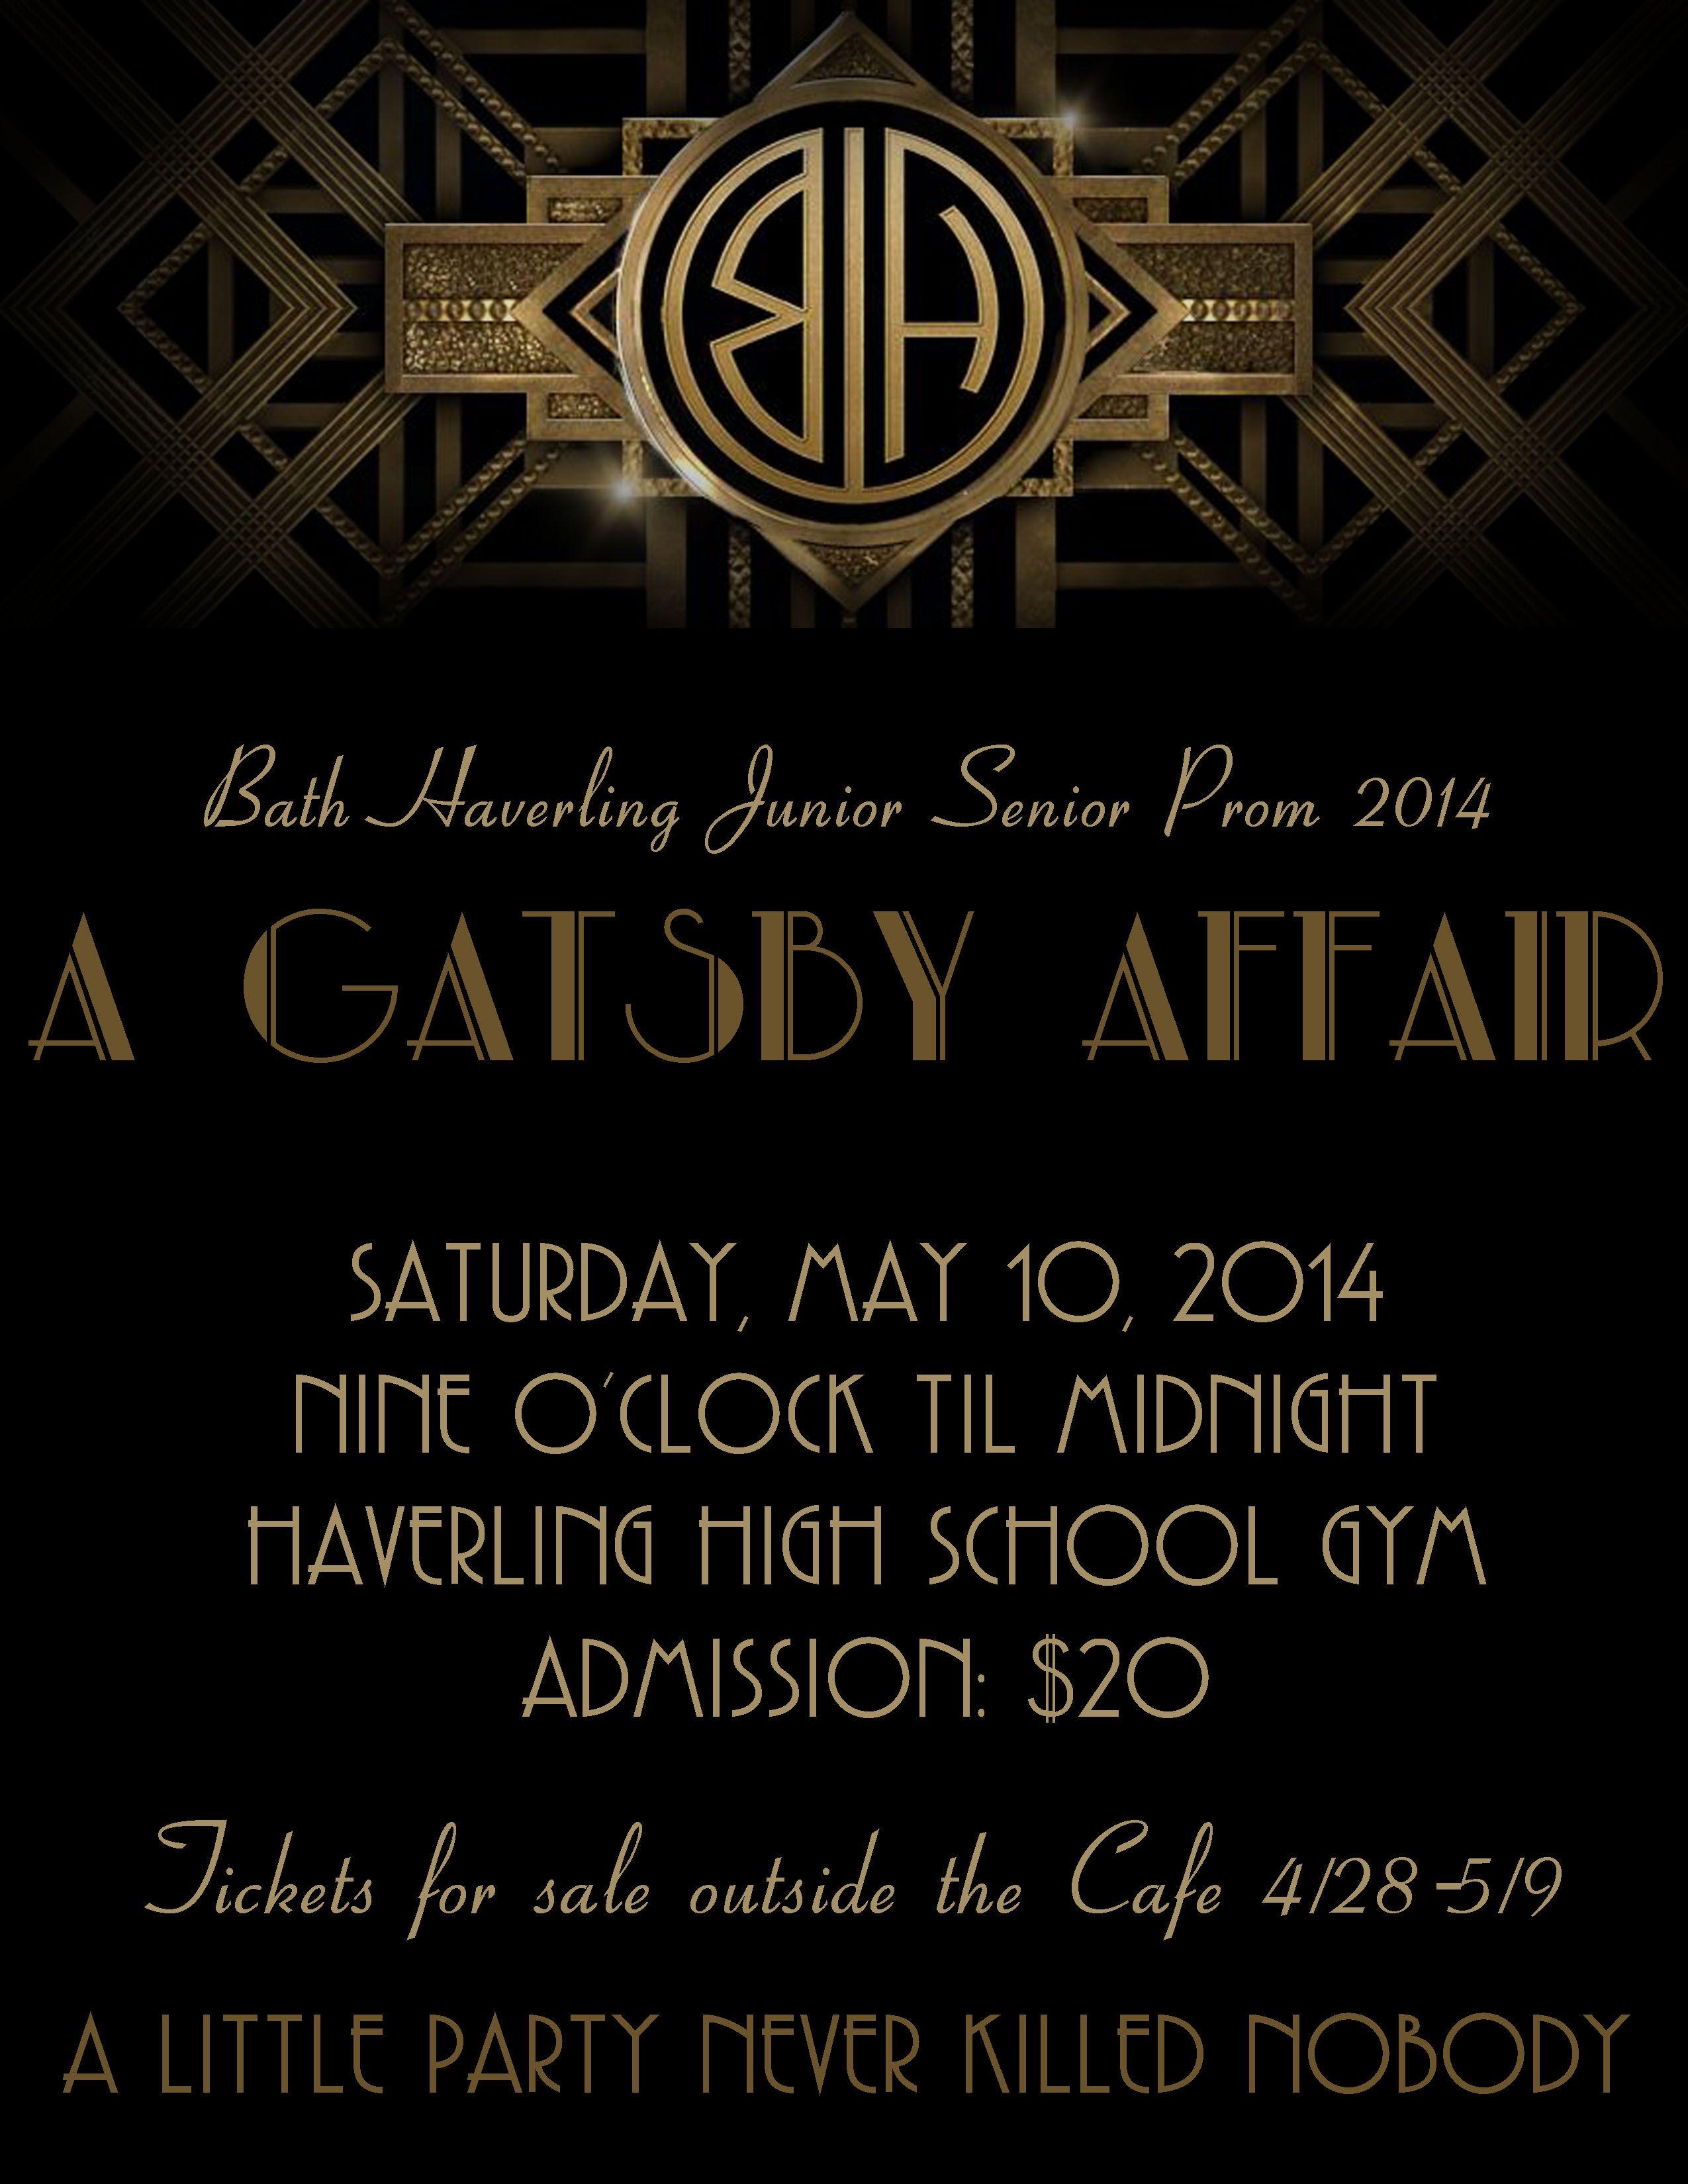 Class of 2014 Senior Prom CLHS. OMG @J O Jo Skye prom is tomorrow ...